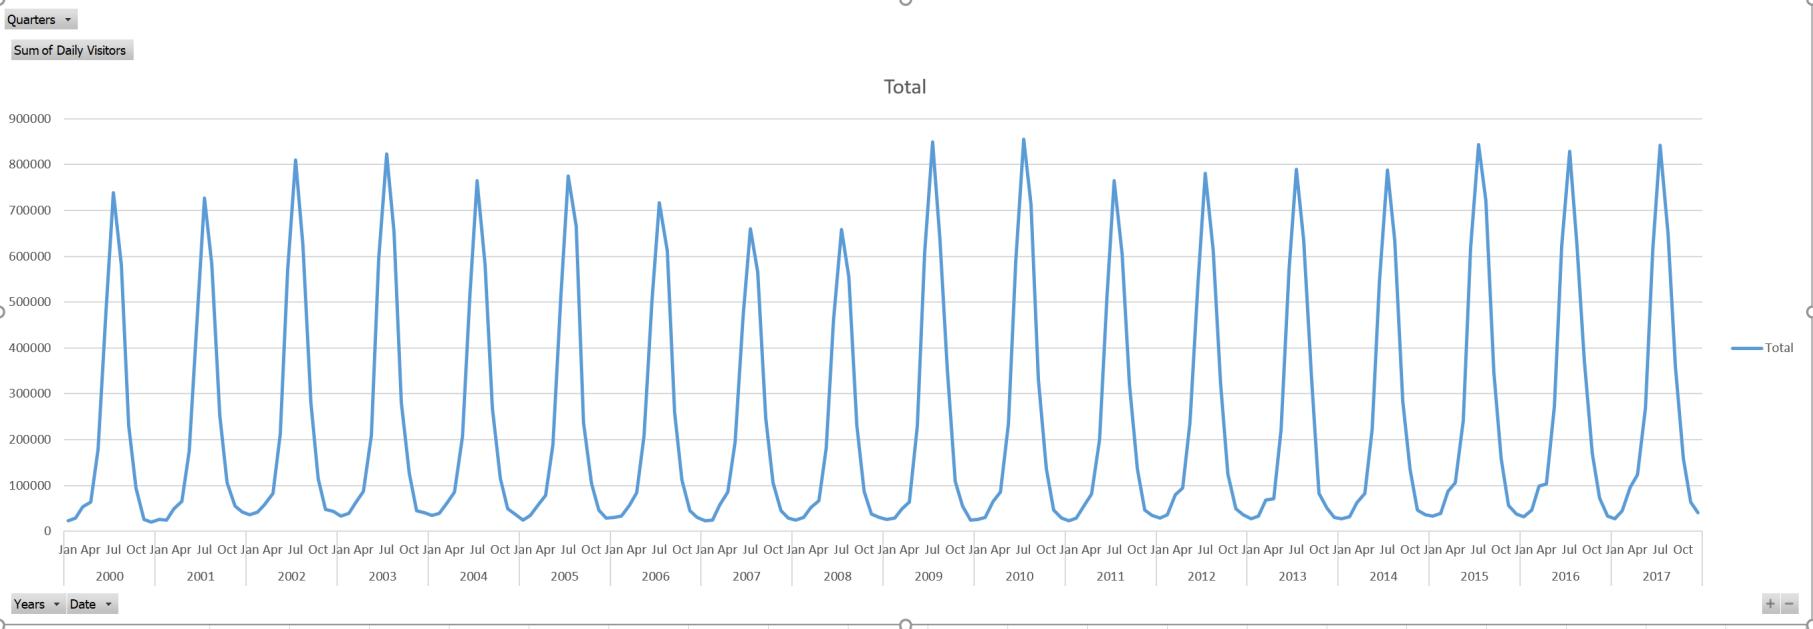 Mount Rushmore attendance data